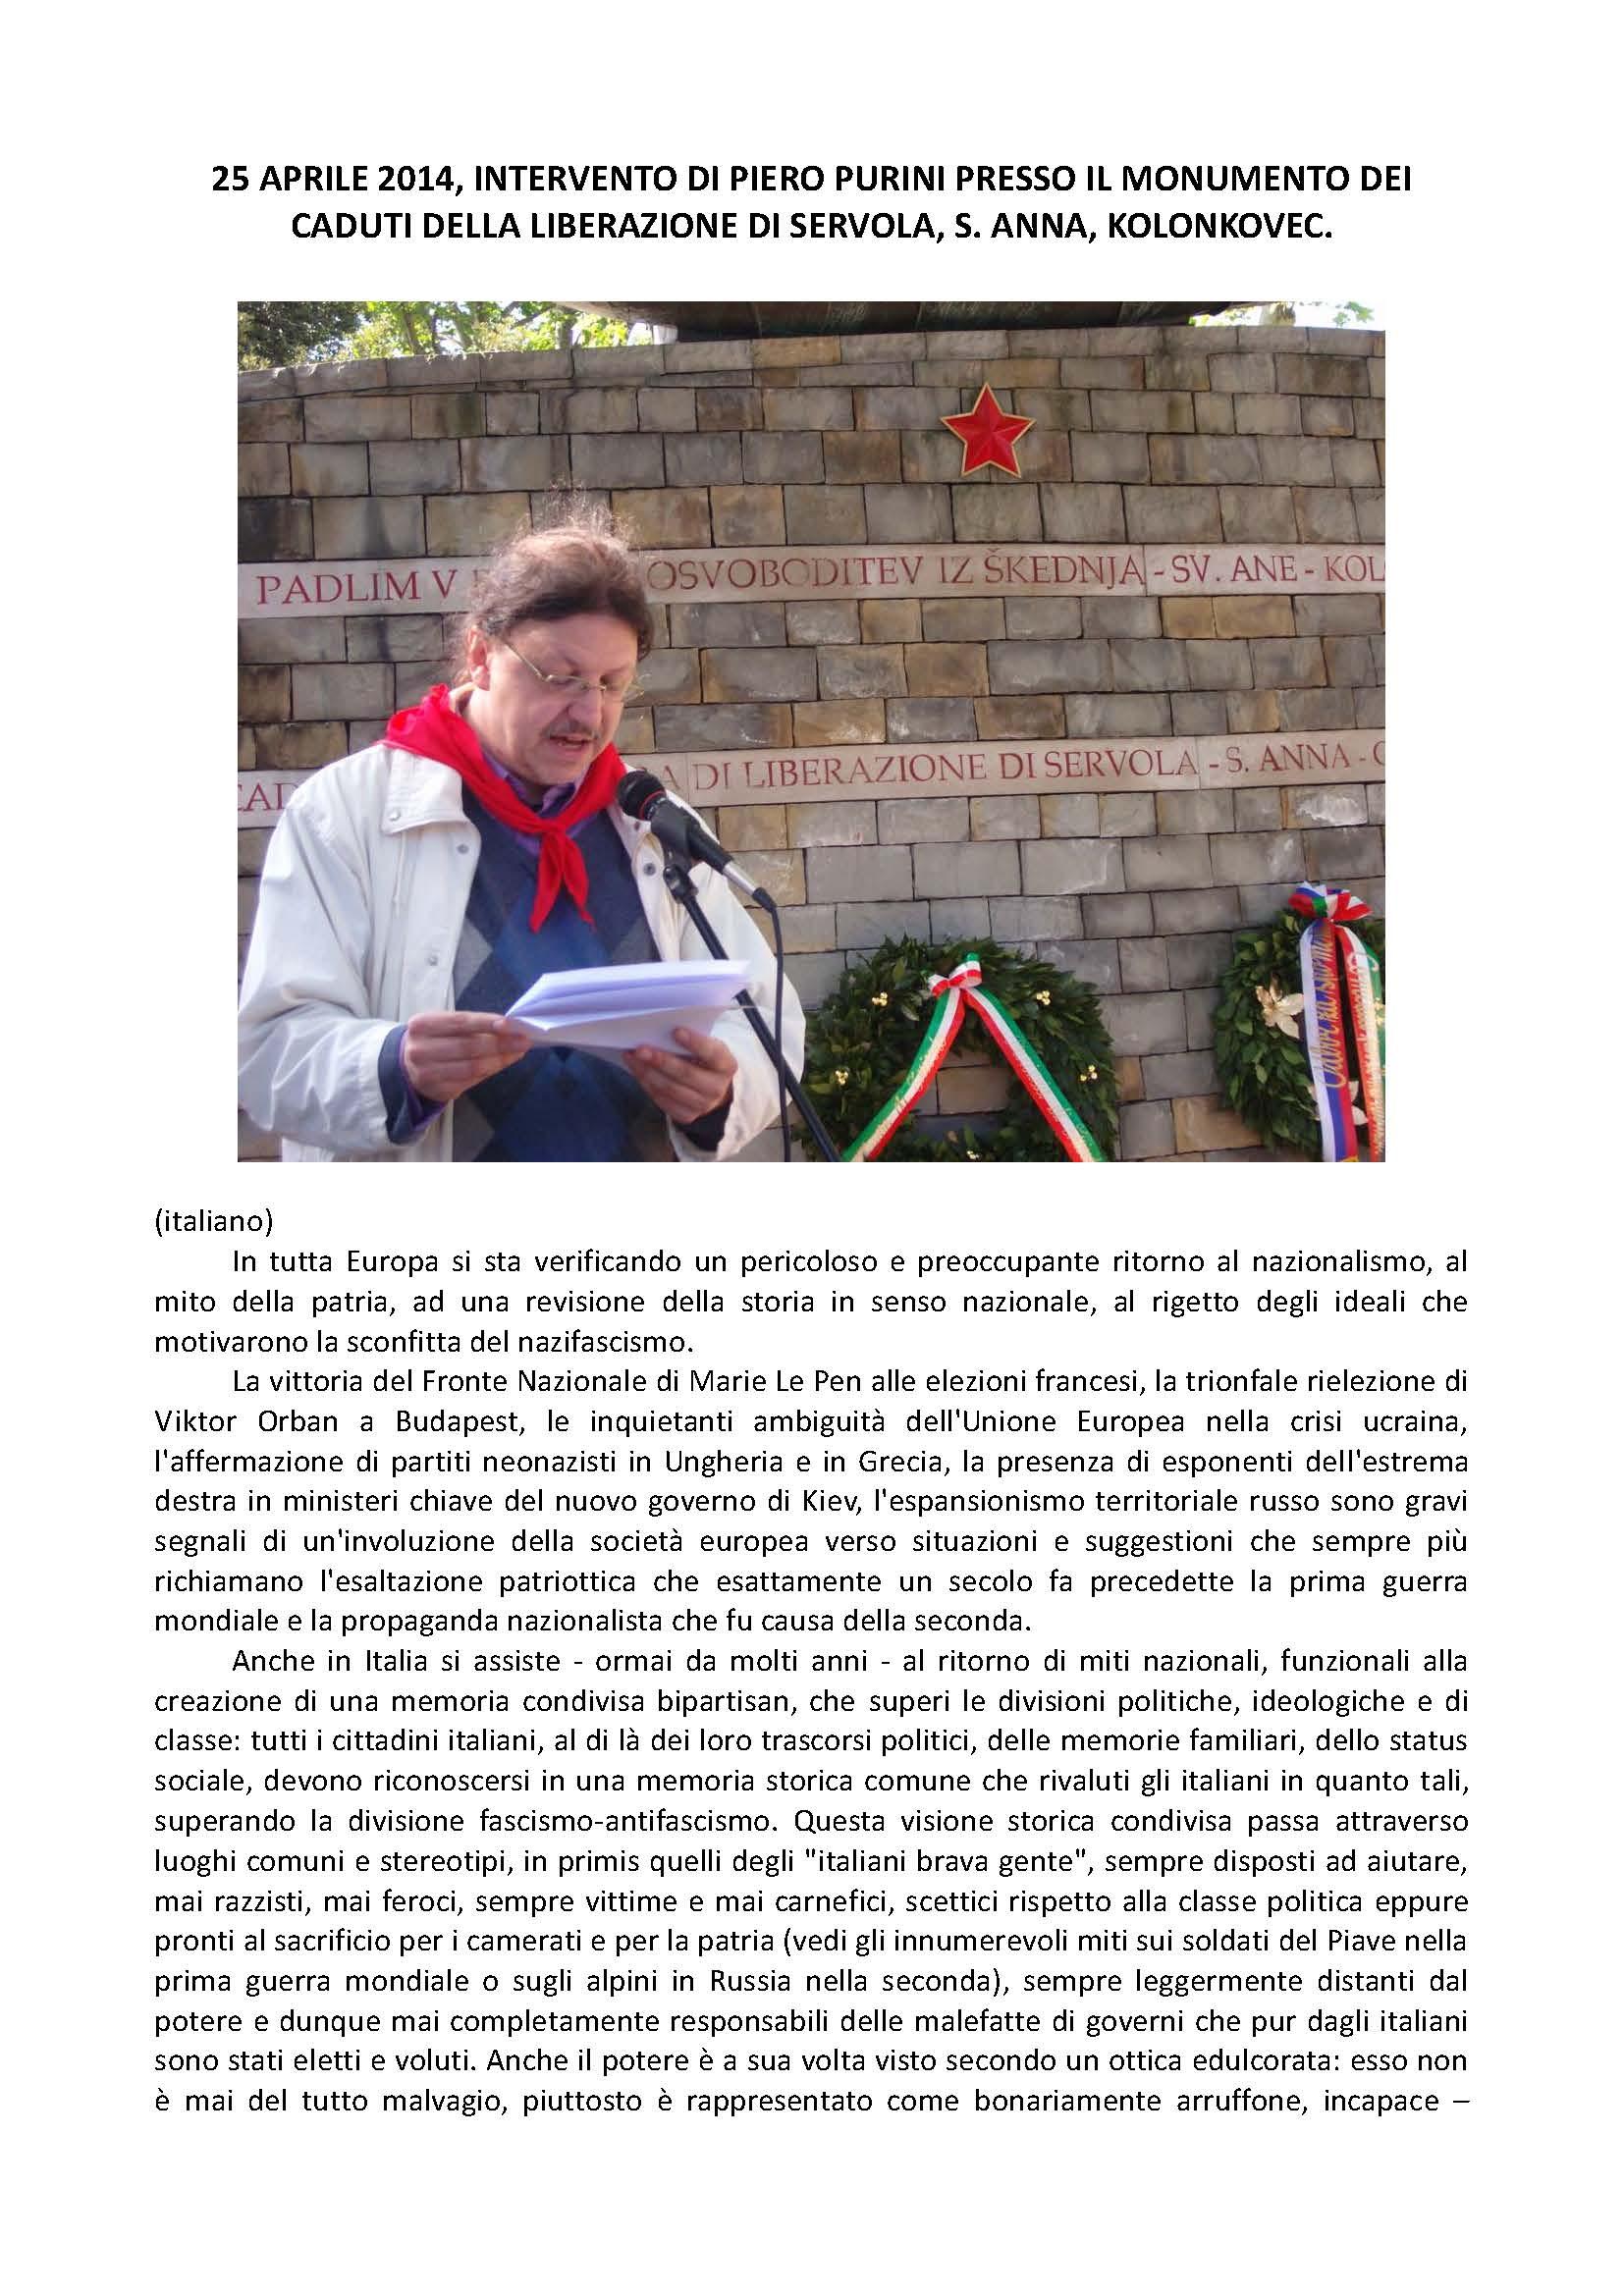 Piero-Purini-25-aprile-2014_Page_1